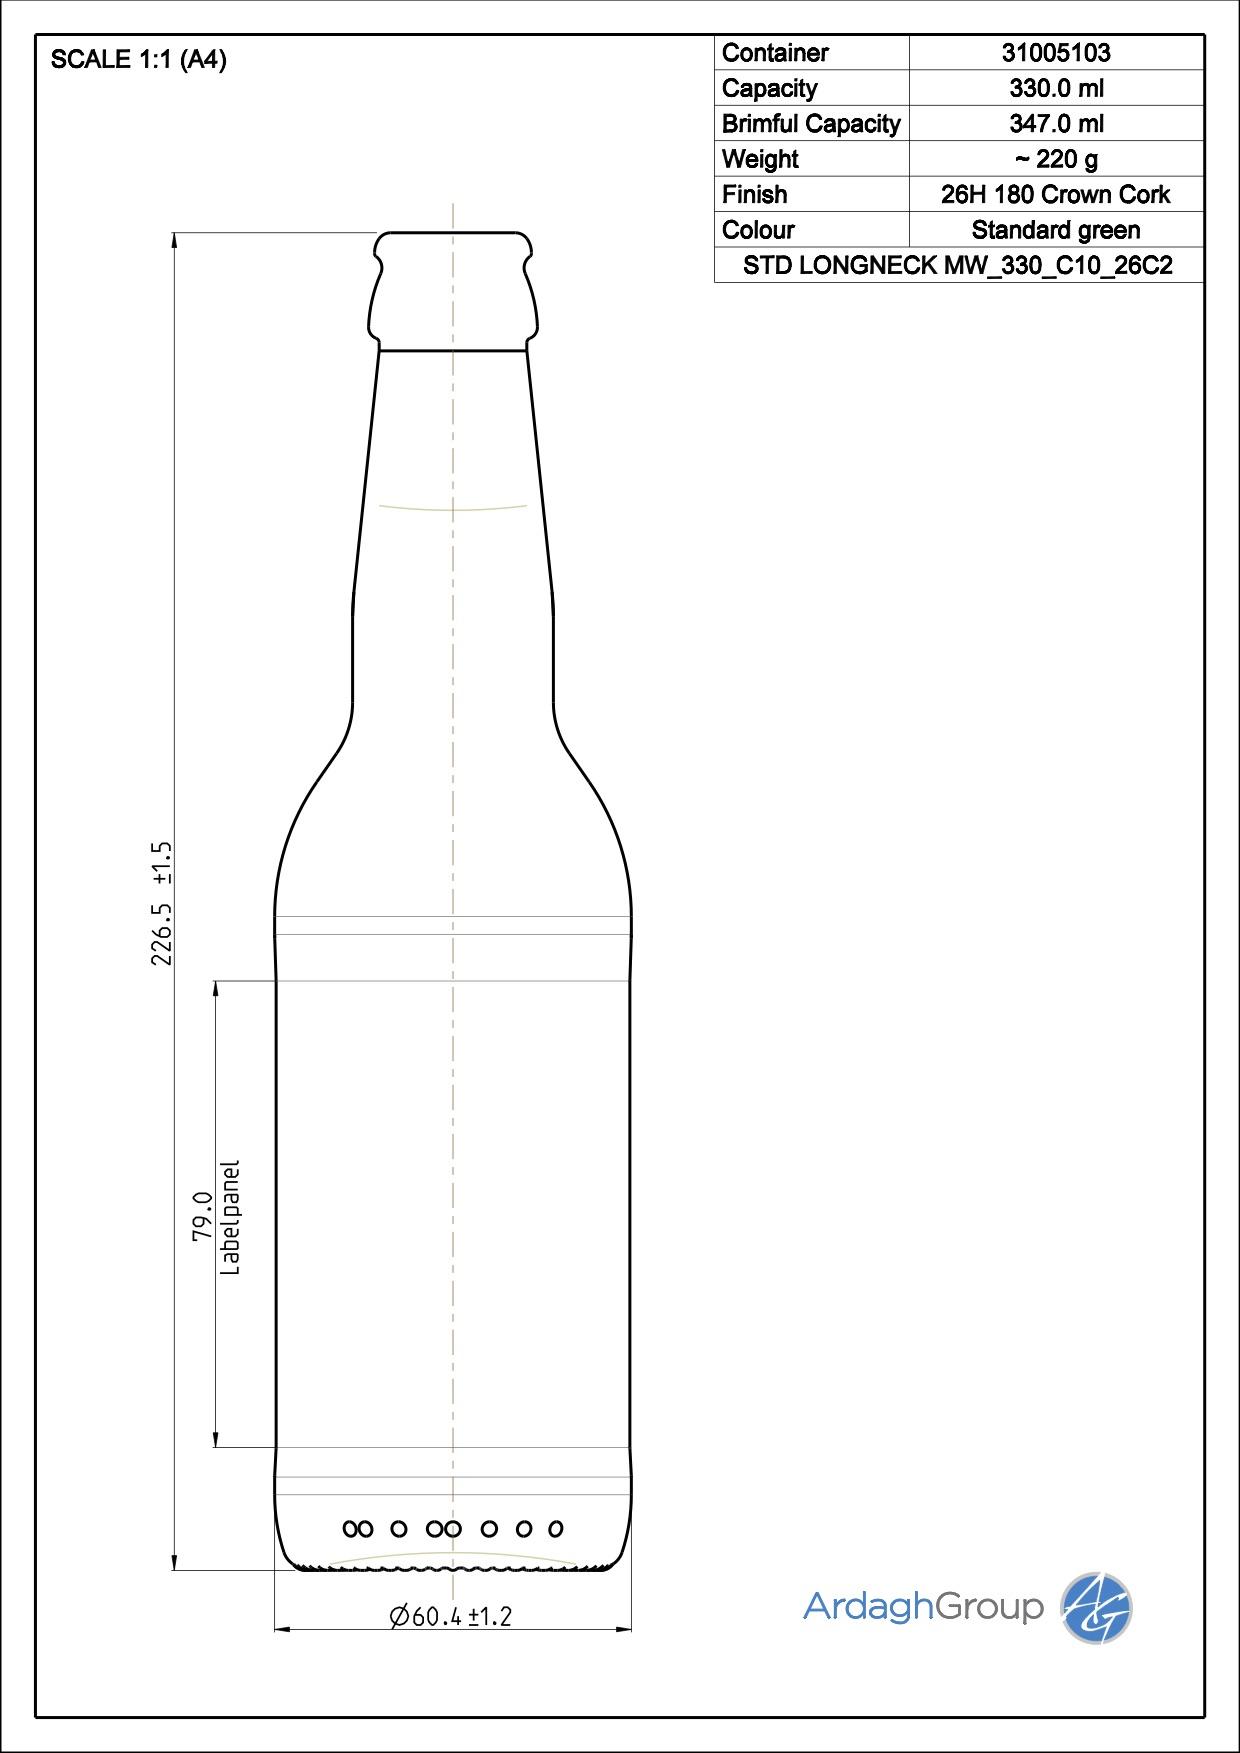 330ml green glass Longneck oneway beer bottle